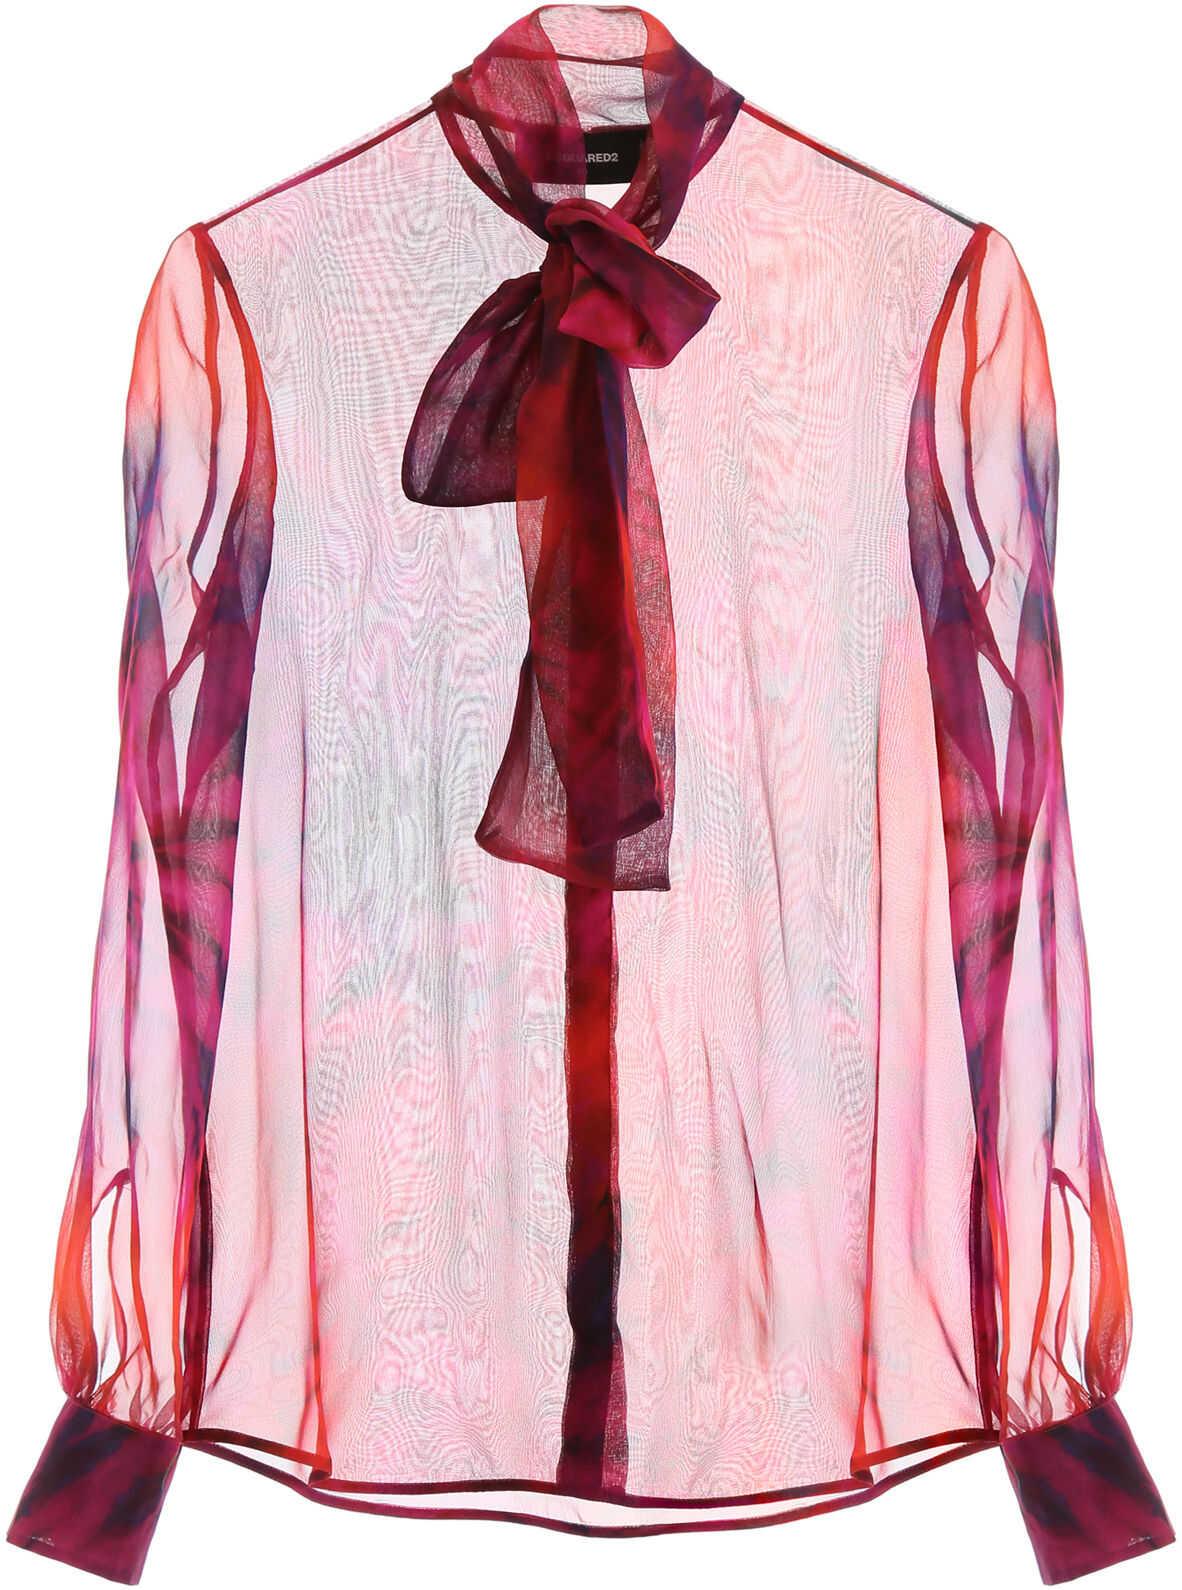 DSQUARED2 Tie-Dye Silk Shirt FUXIA MIX COLOR